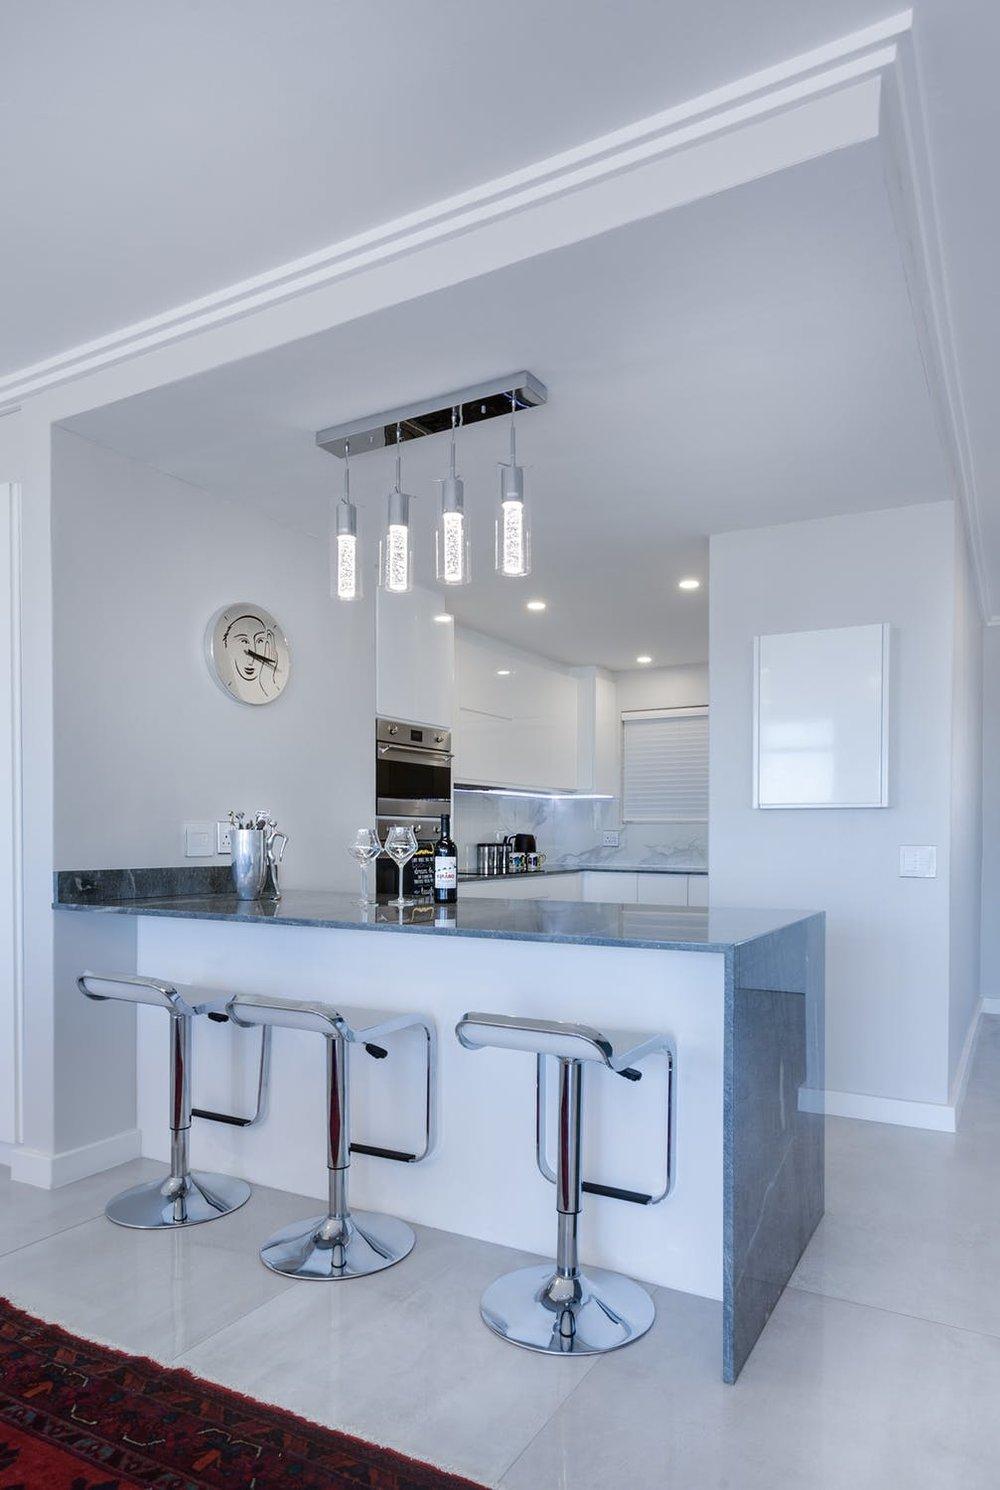 Kitchen remodeling ideas Long Beach